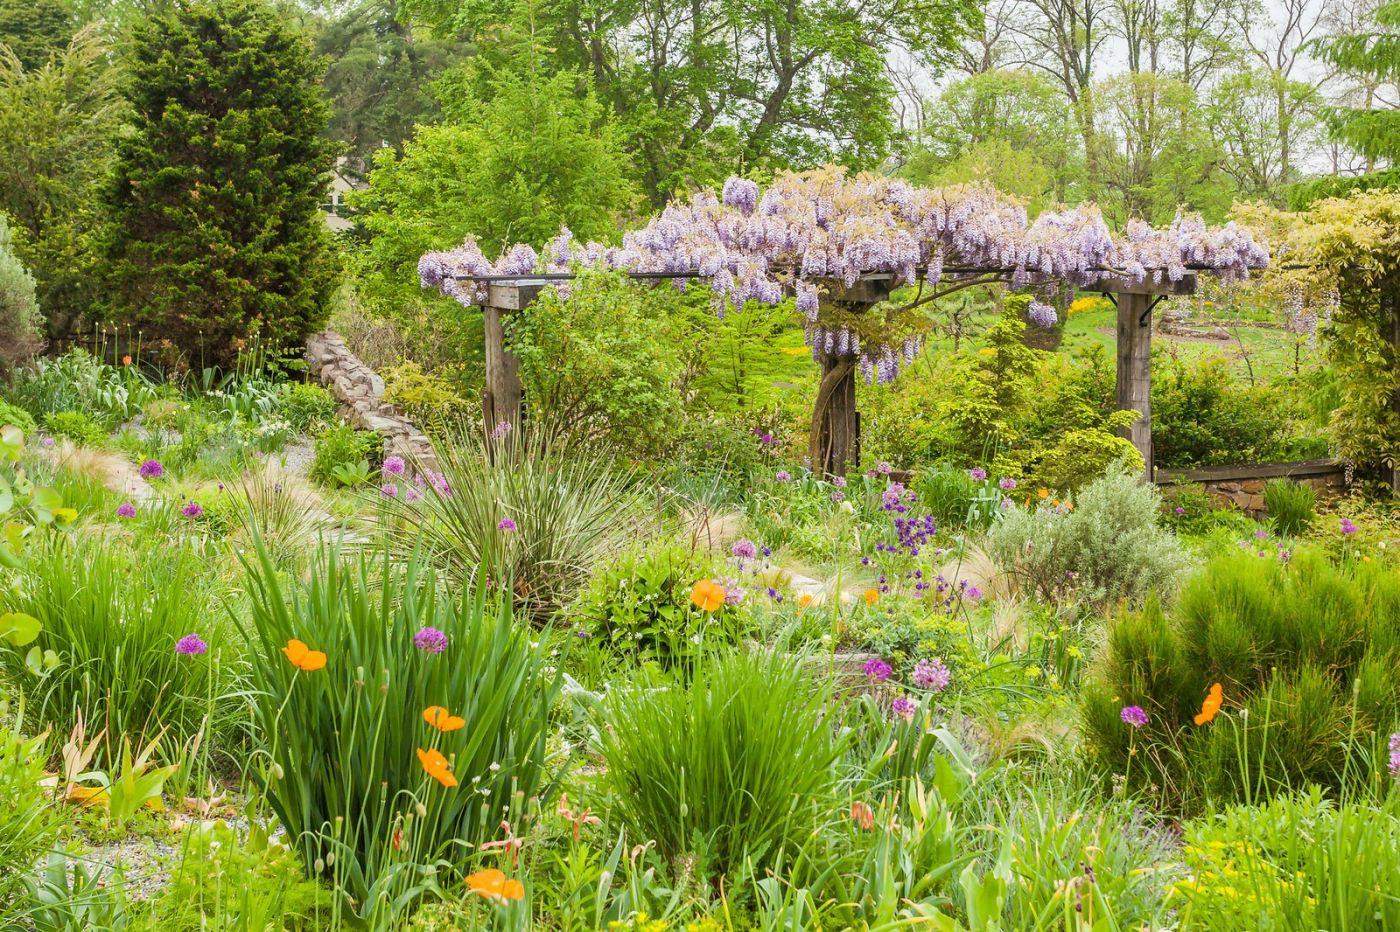 Chanticleer花园,那年盛开的紫藤花_图1-16